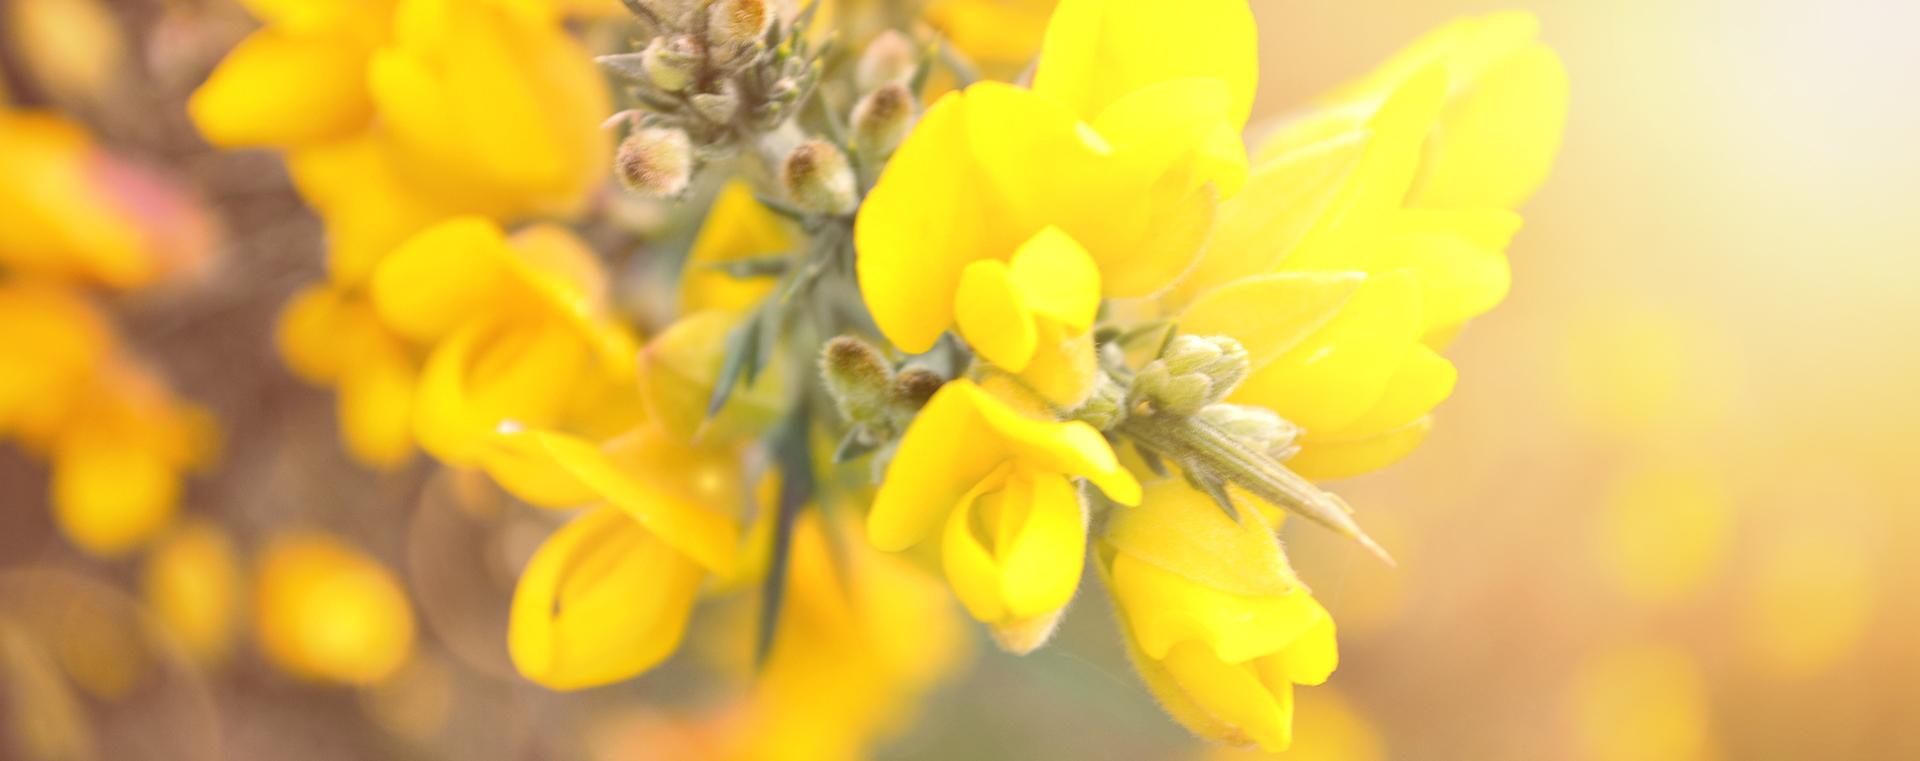 Nr 13 Gorse Stechginster Unsicherheit Lemon Pharma Original Bachblüten Dr. Bach